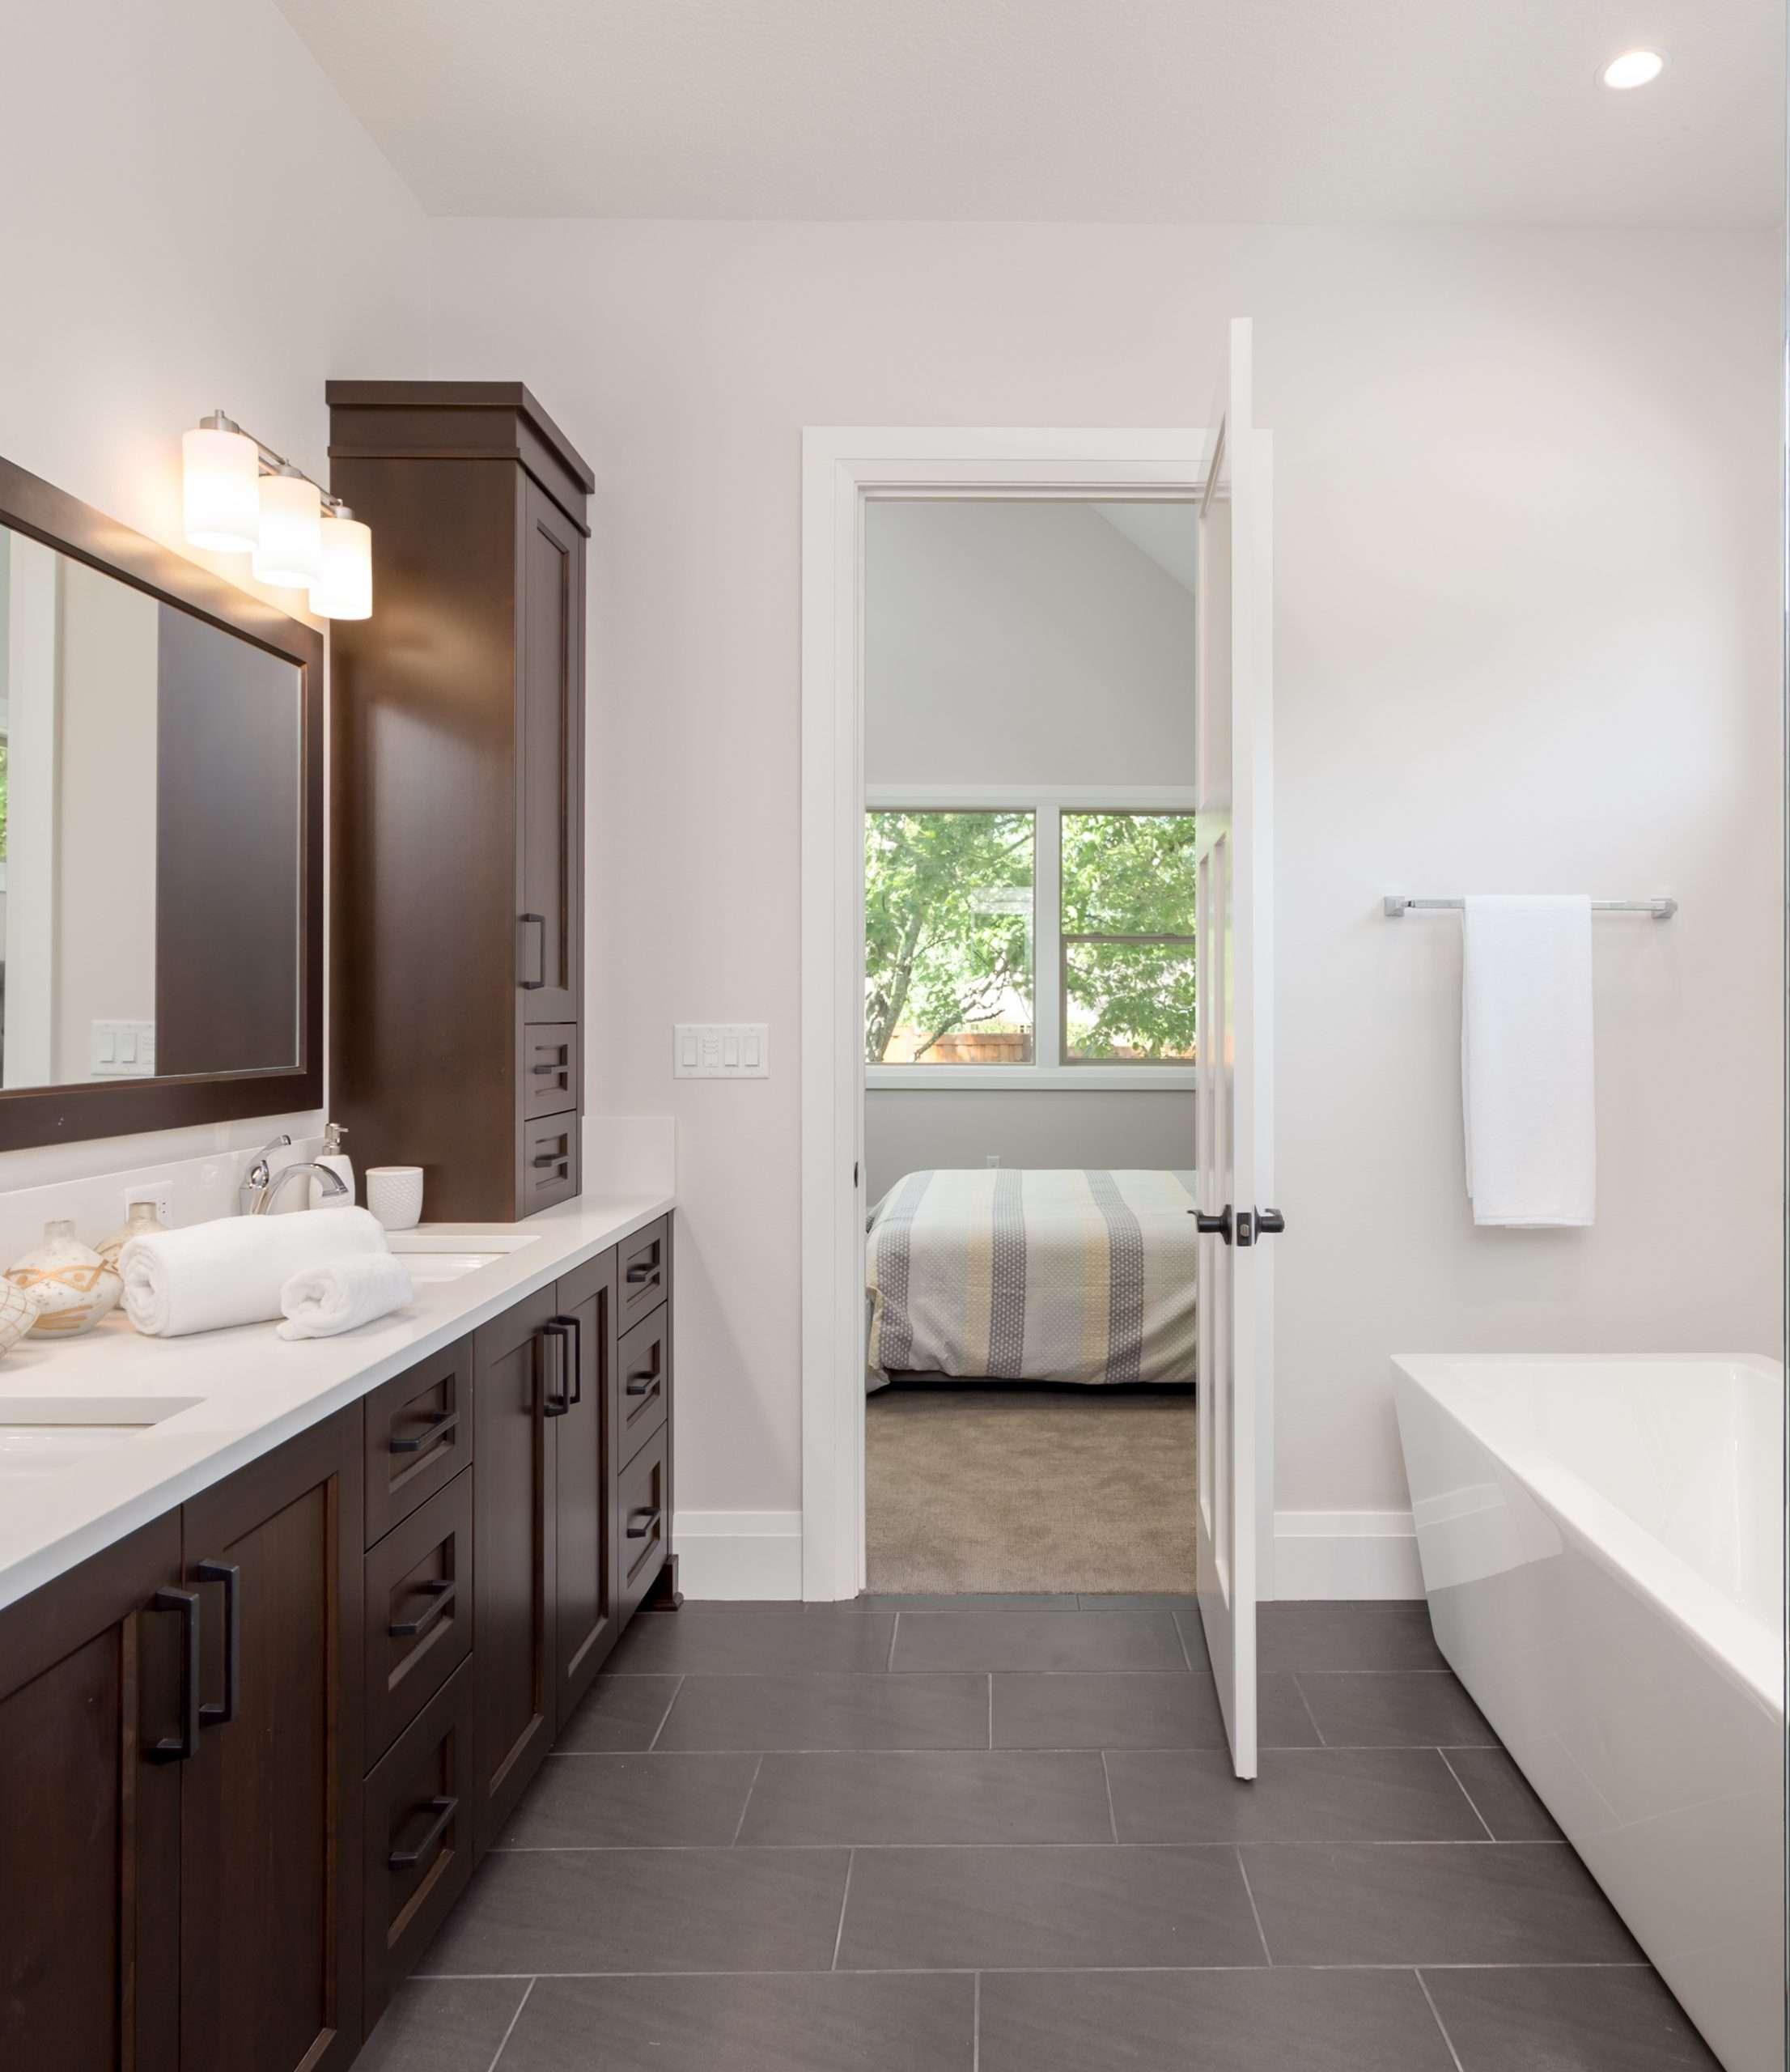 Luxury Vinyl Tiles in the bathroom